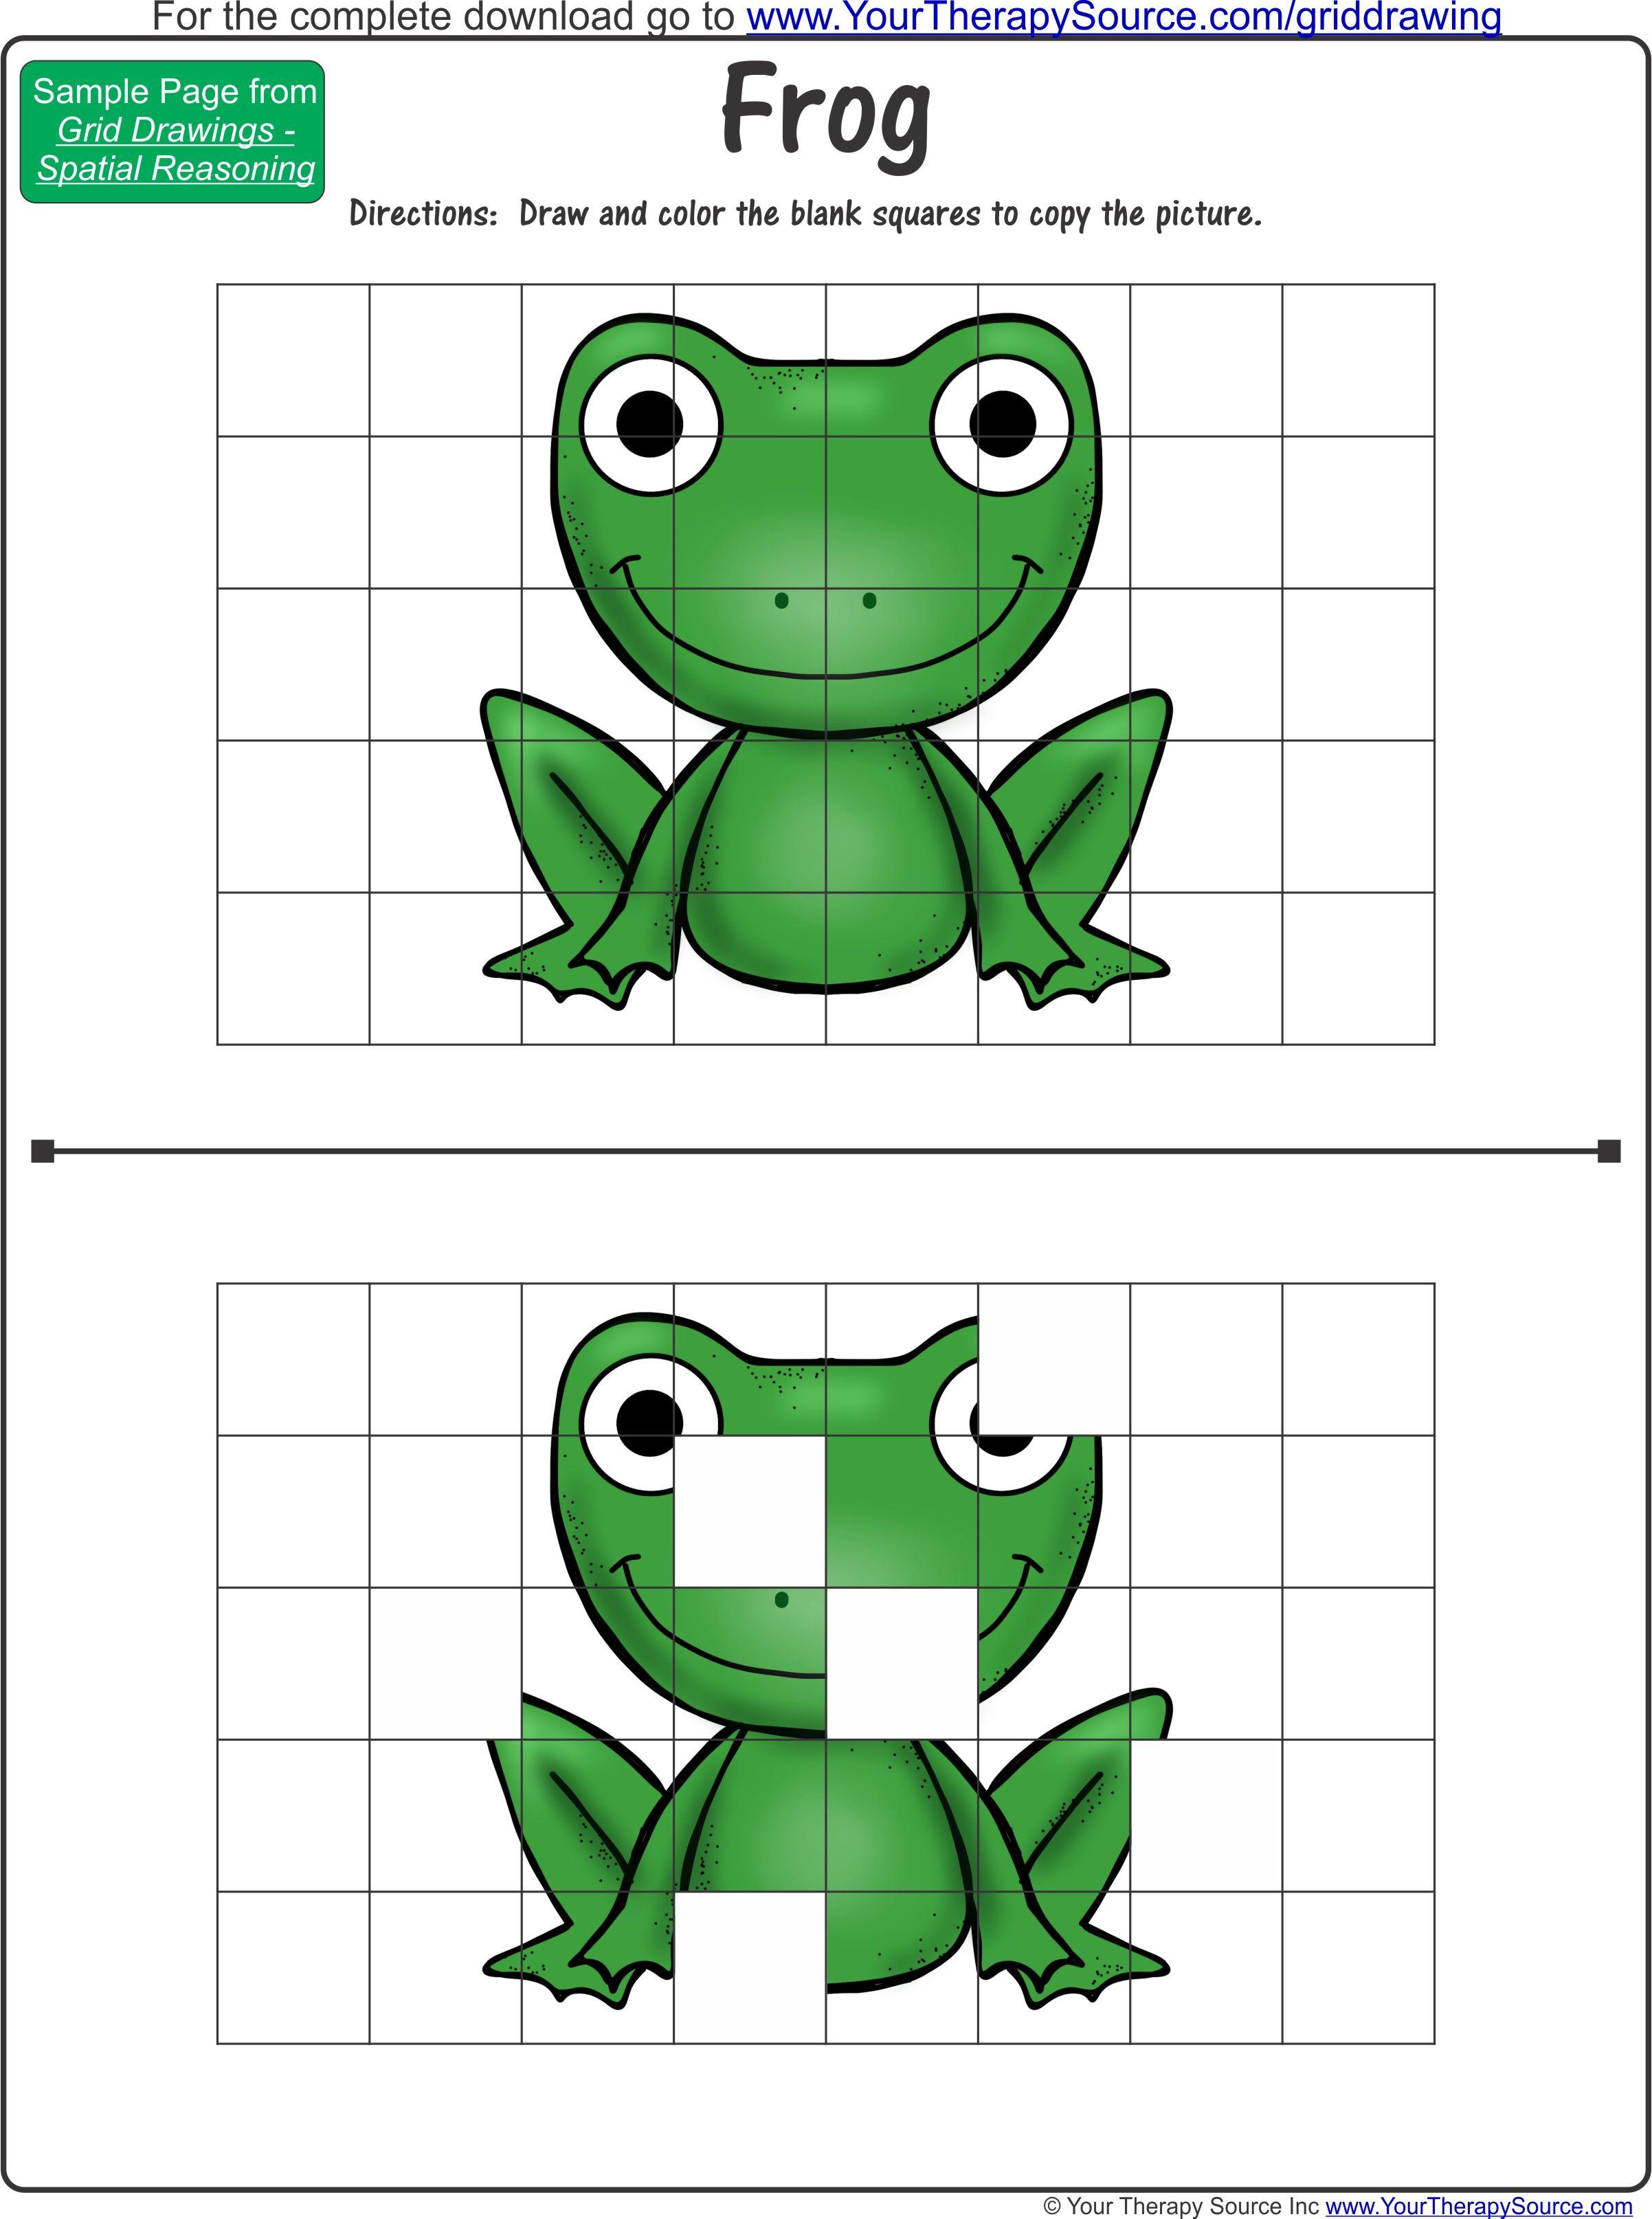 Free Frog Grid Drawing